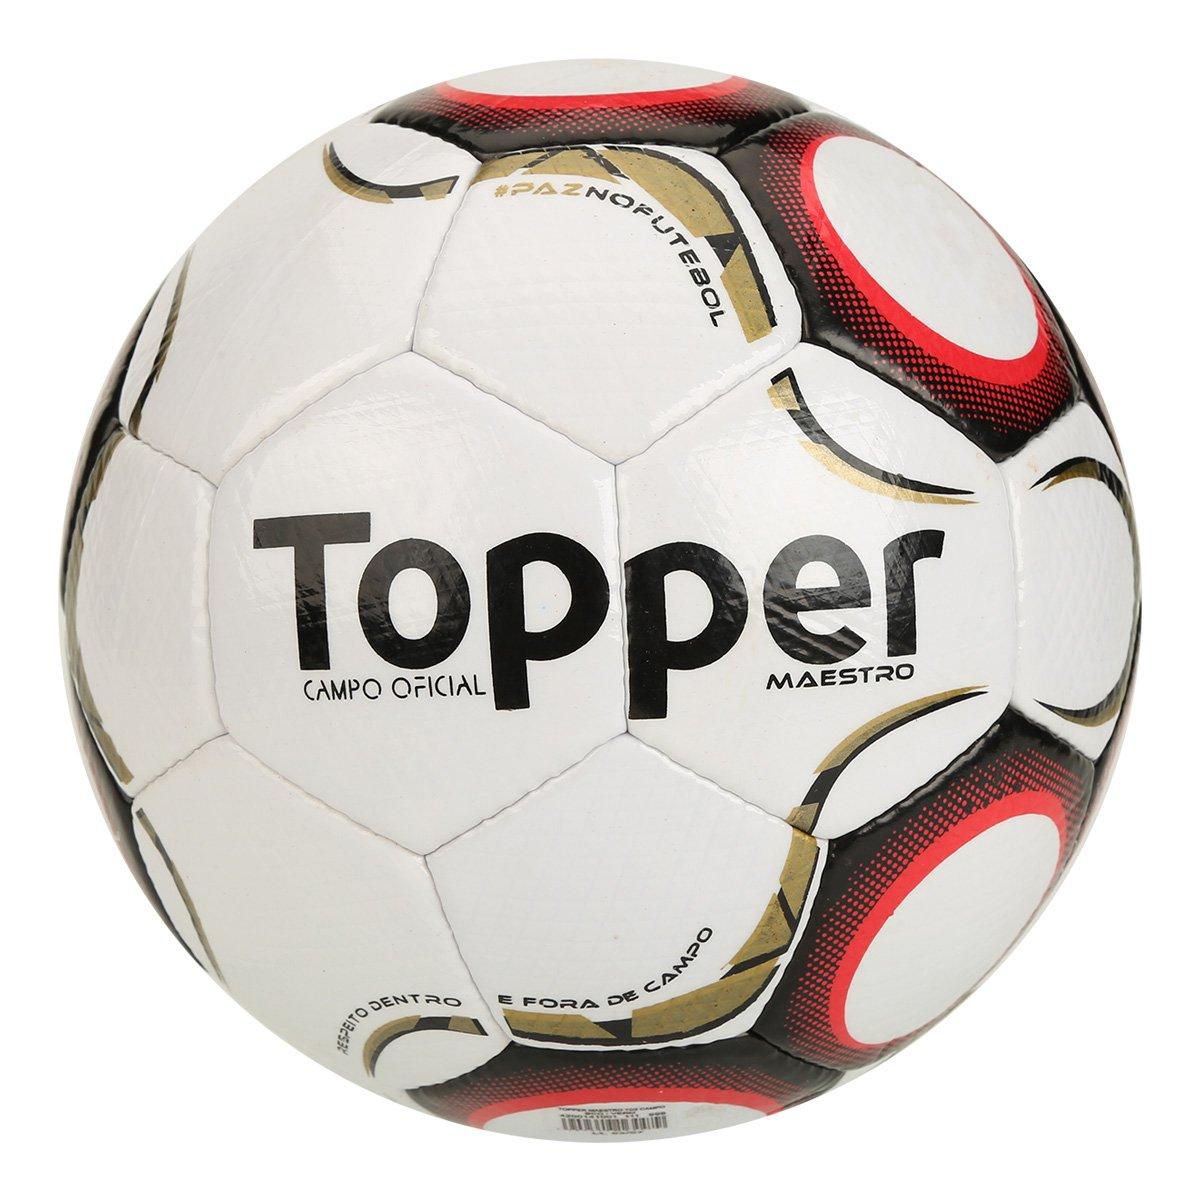 e0cb41a8e6818 Bola Futebol Campo Topper Maestro TD2 - Compre Agora